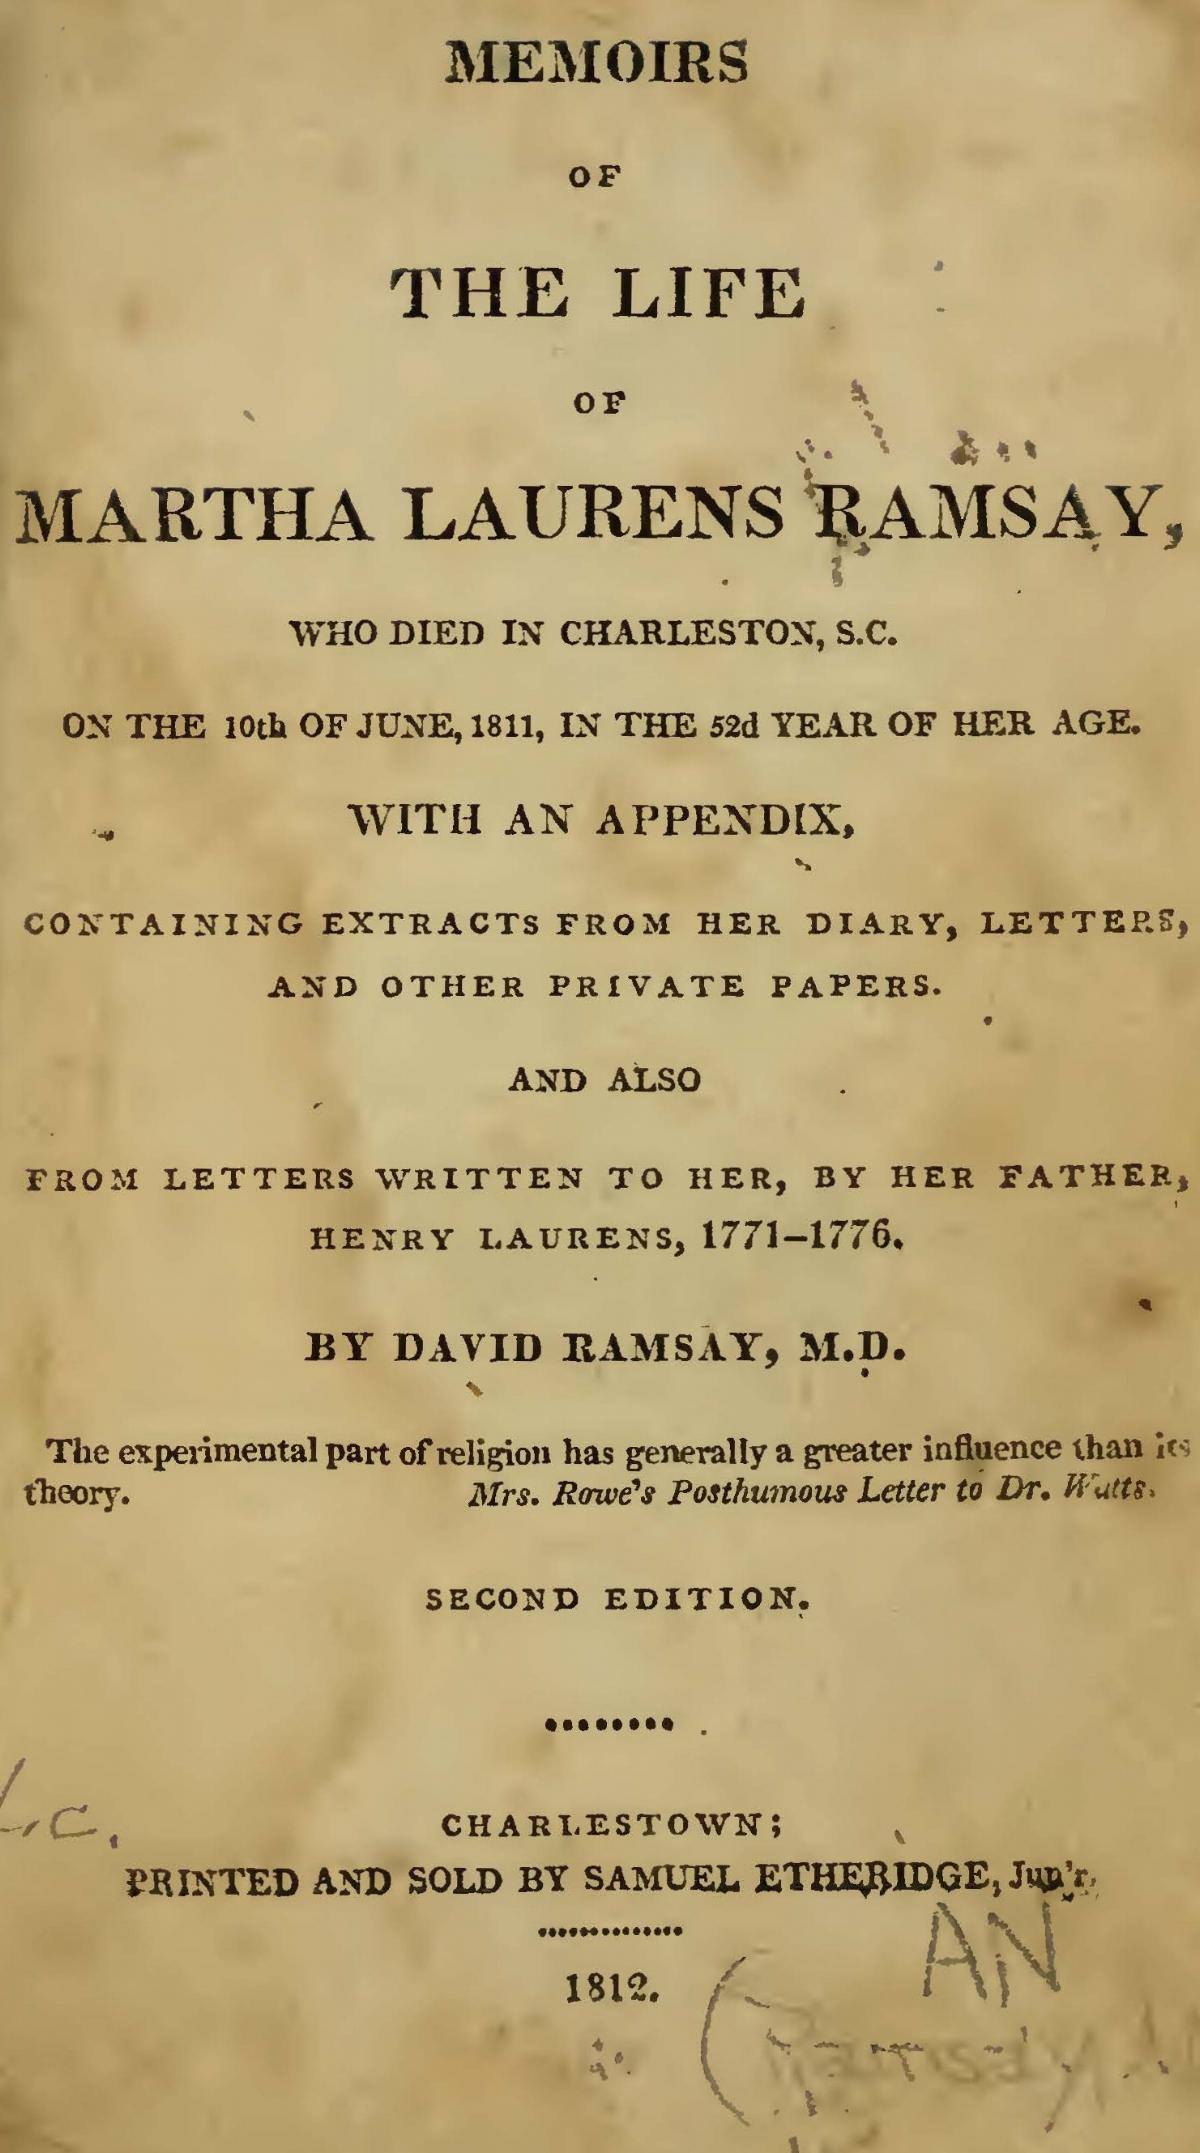 Ramsay, David, Memoirs of the Life of Martha Laurens Ramsay Title Page.jpg